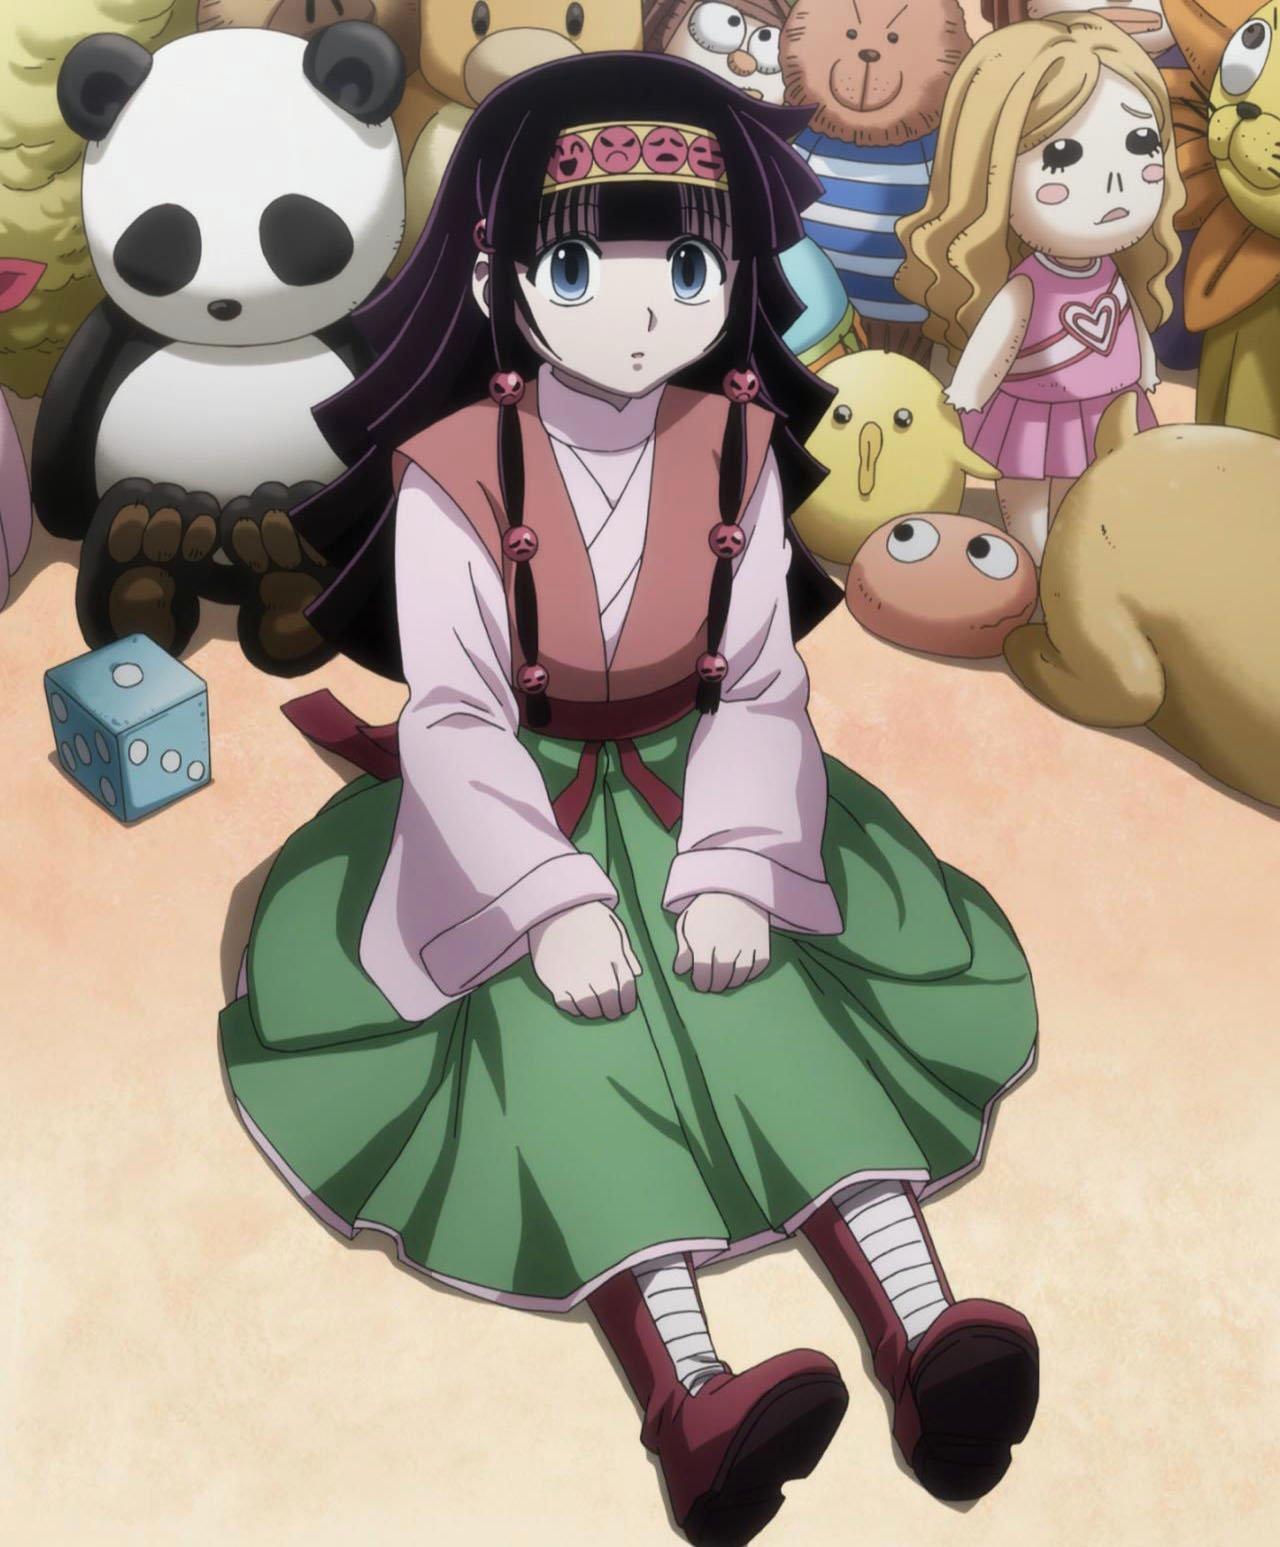 Hentai family guy ask to suck and fuck white woman cartoon anime black man masturbation classic movie - 4 3